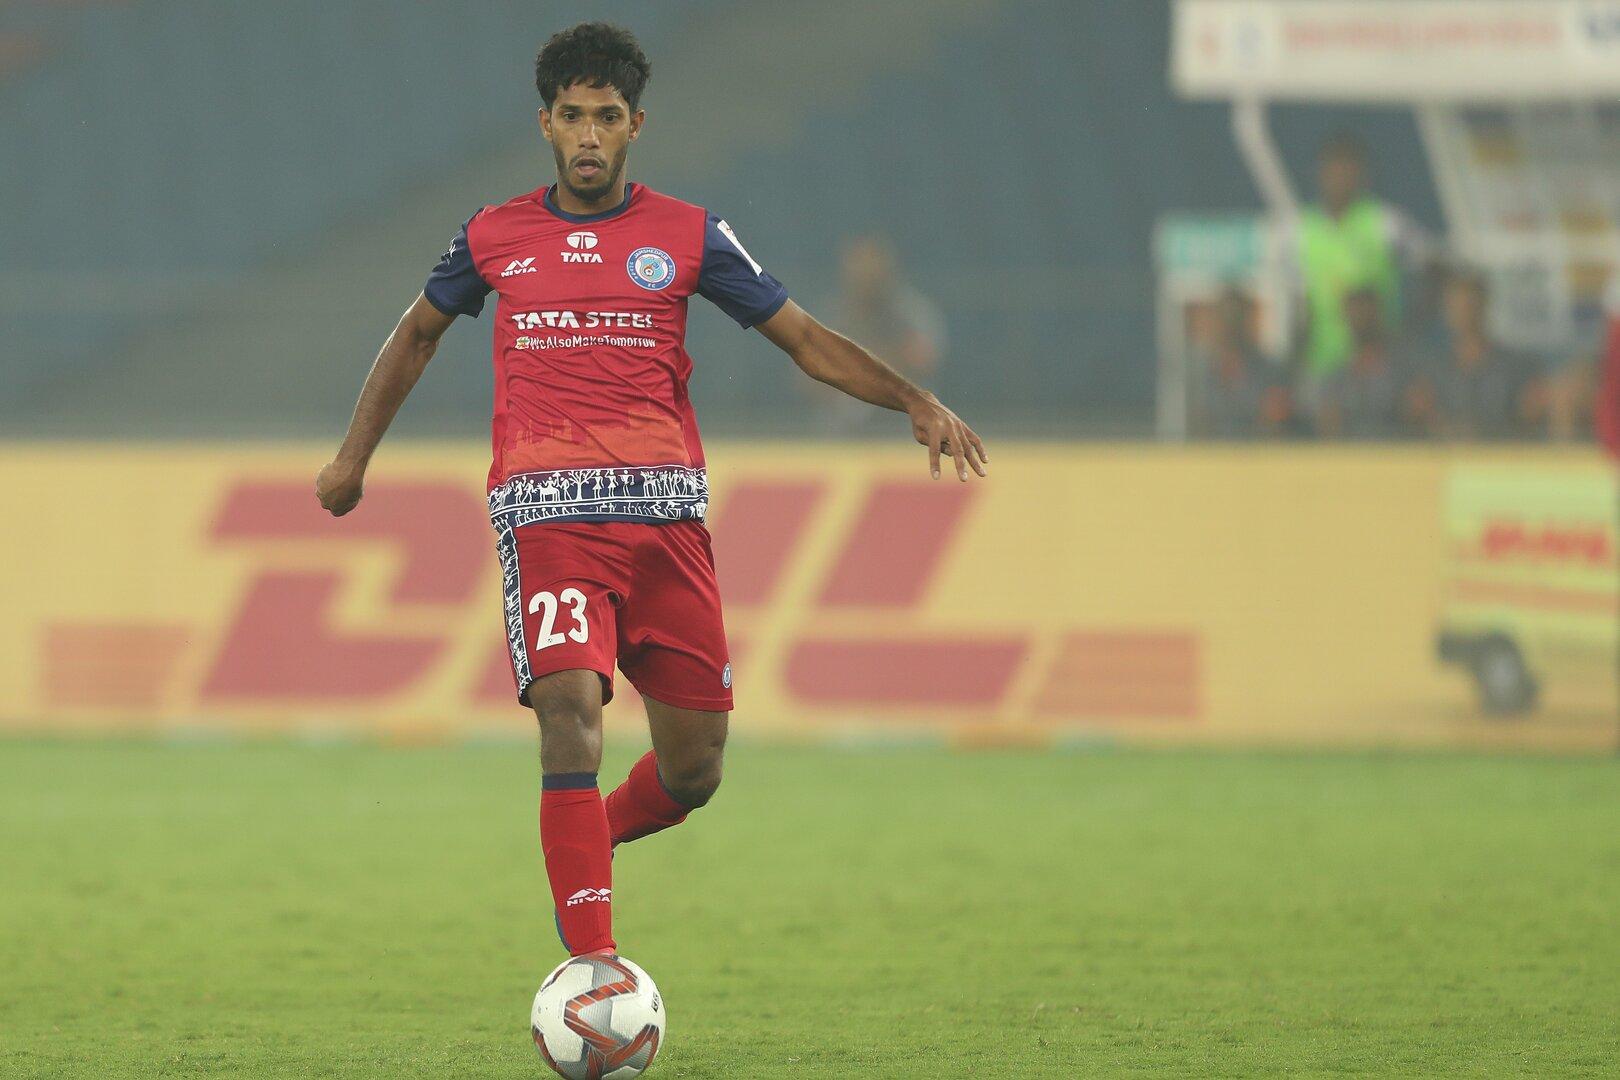 ISL 2018-19 Jamshedpur FC Michael Soosairaj